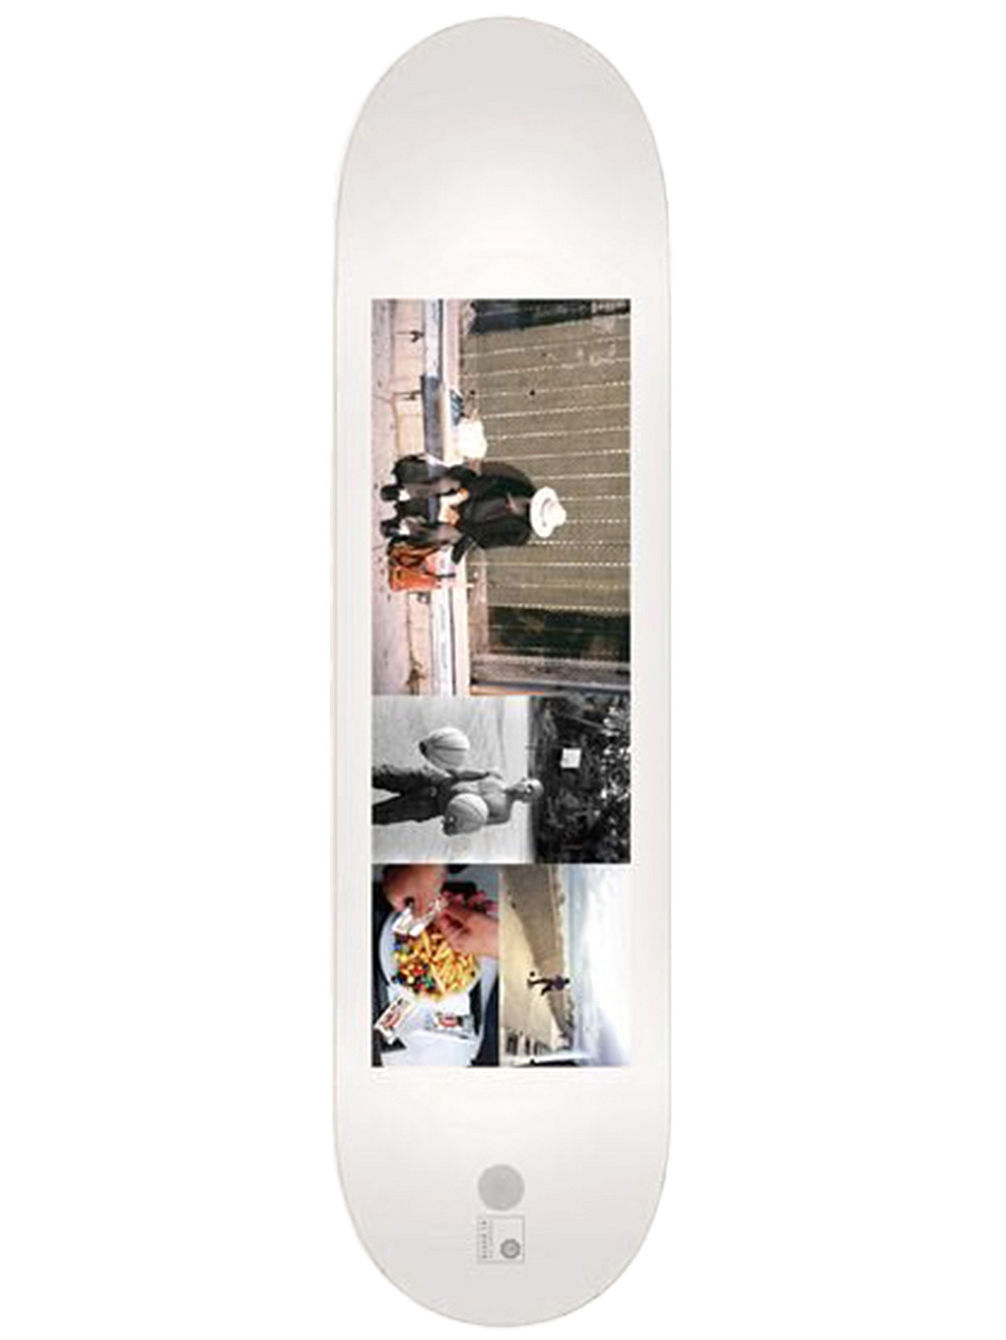 davis-shoot-film-8375-skateboard-deck